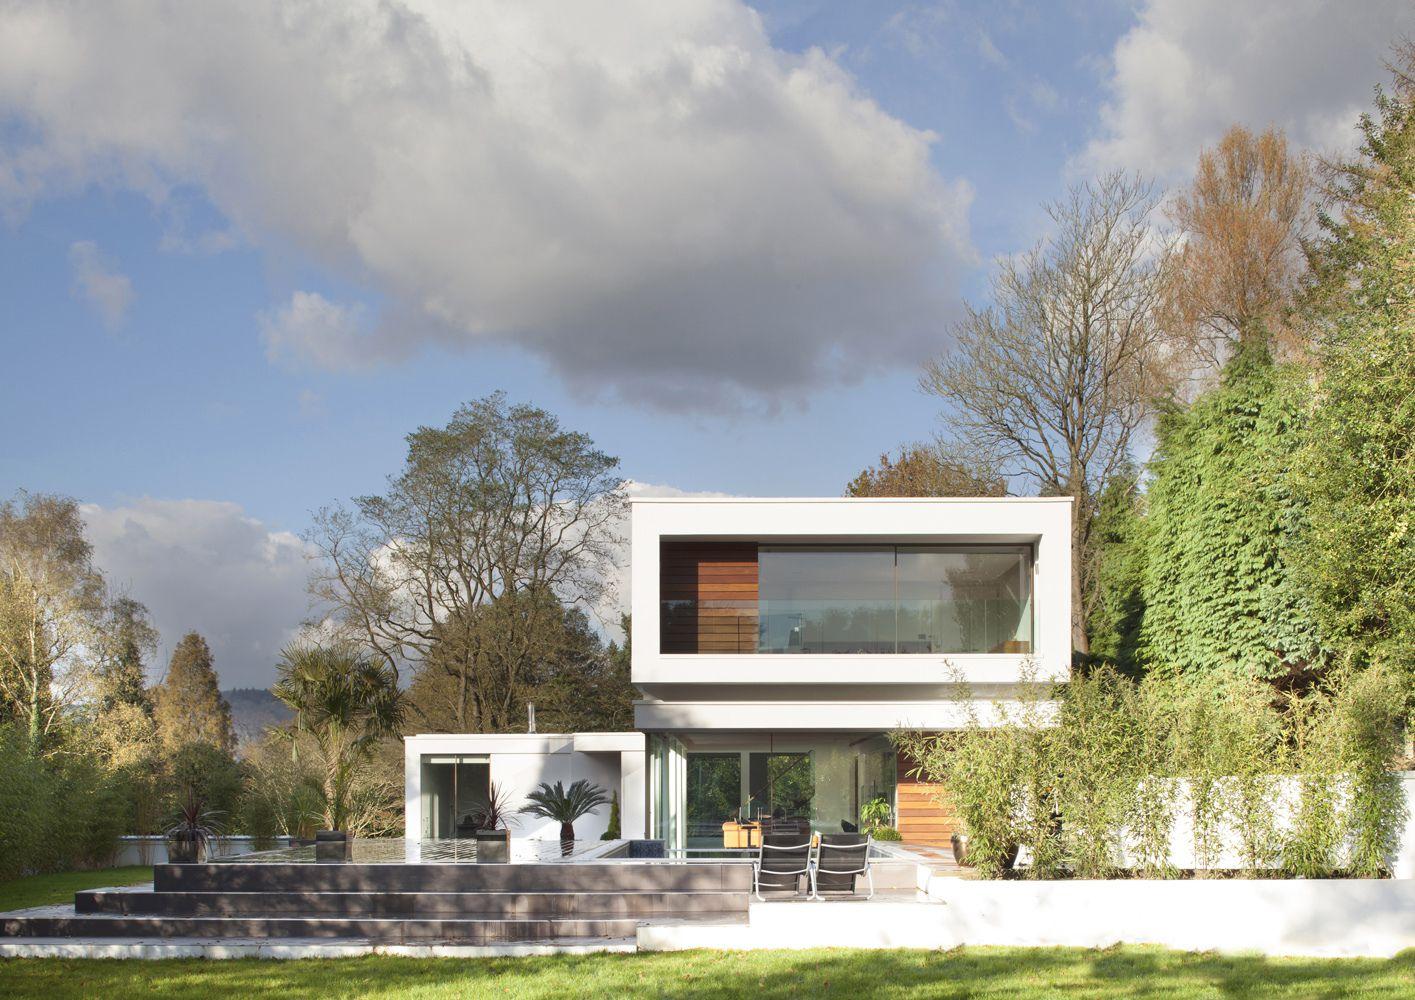 51b9e6f0b3fc4b430e000007_white-lodge-dyergrimes-architects_wl02logan